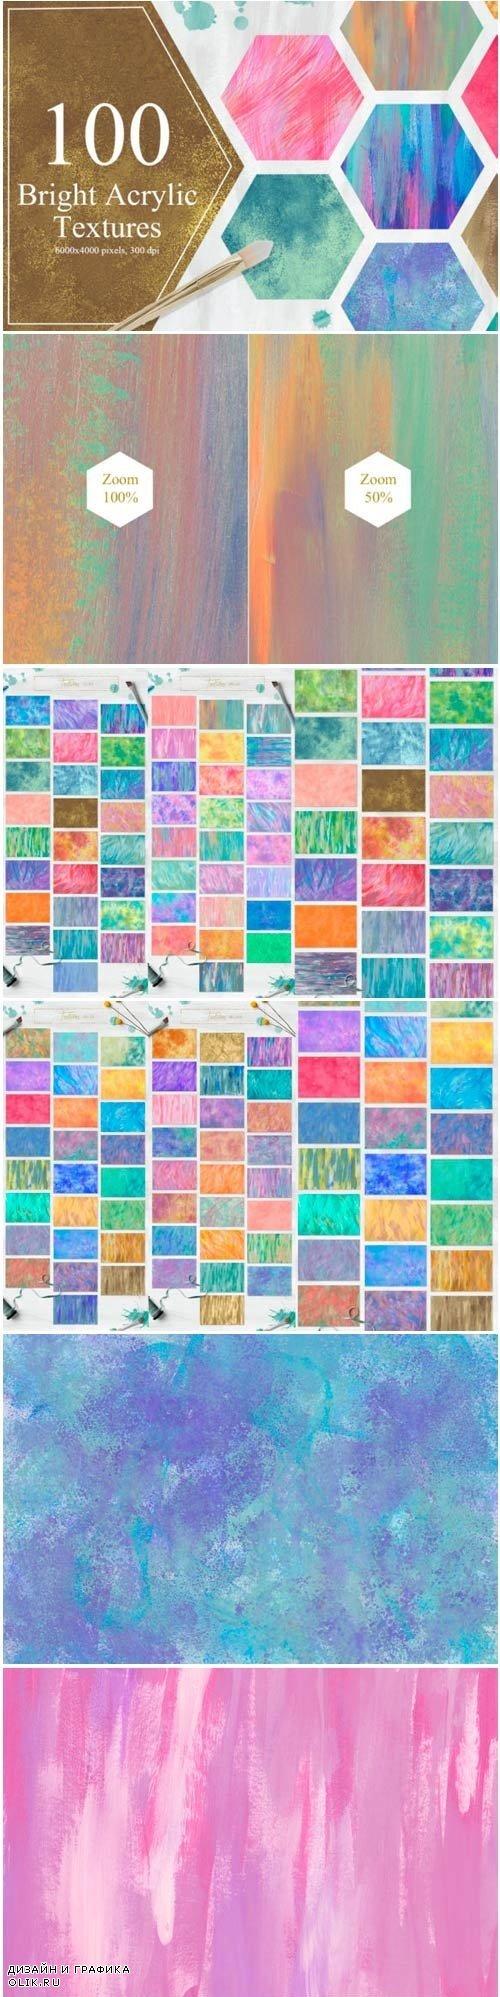 100 Bright Acrylic Textures - 2818018